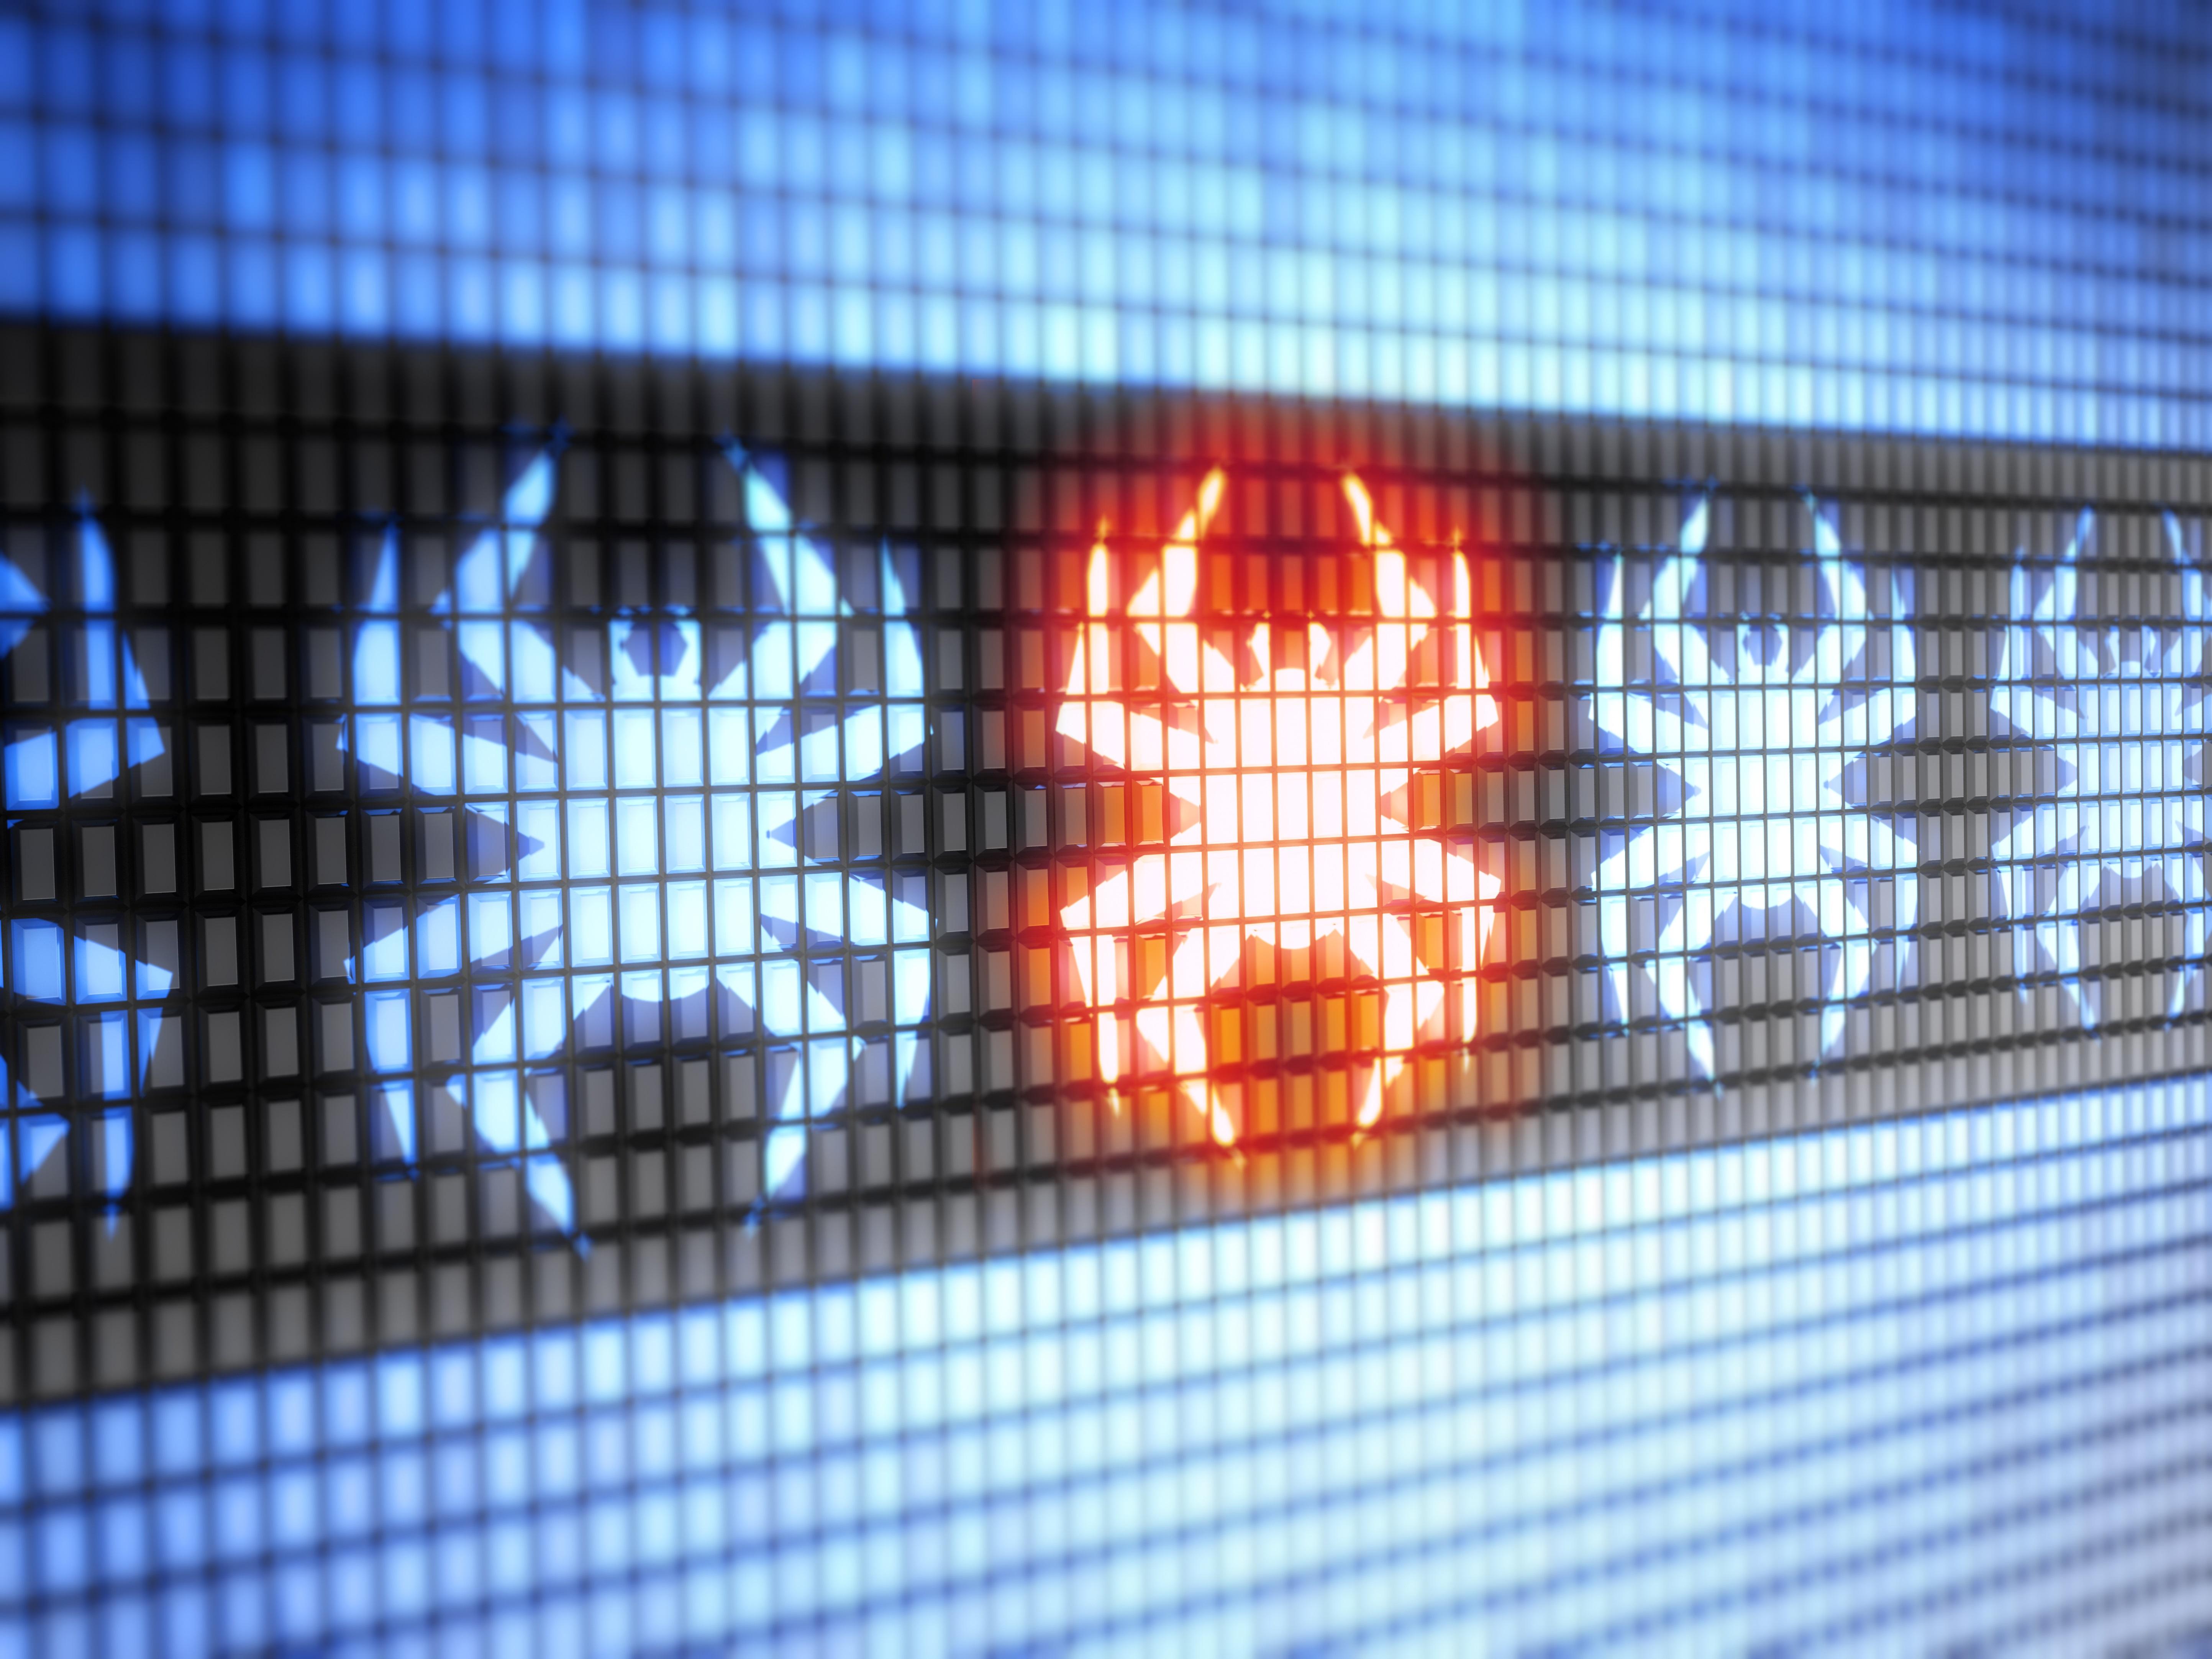 WordPress Woes: A Fake Plugin and Three Zero-Day Vulnerabilities Found